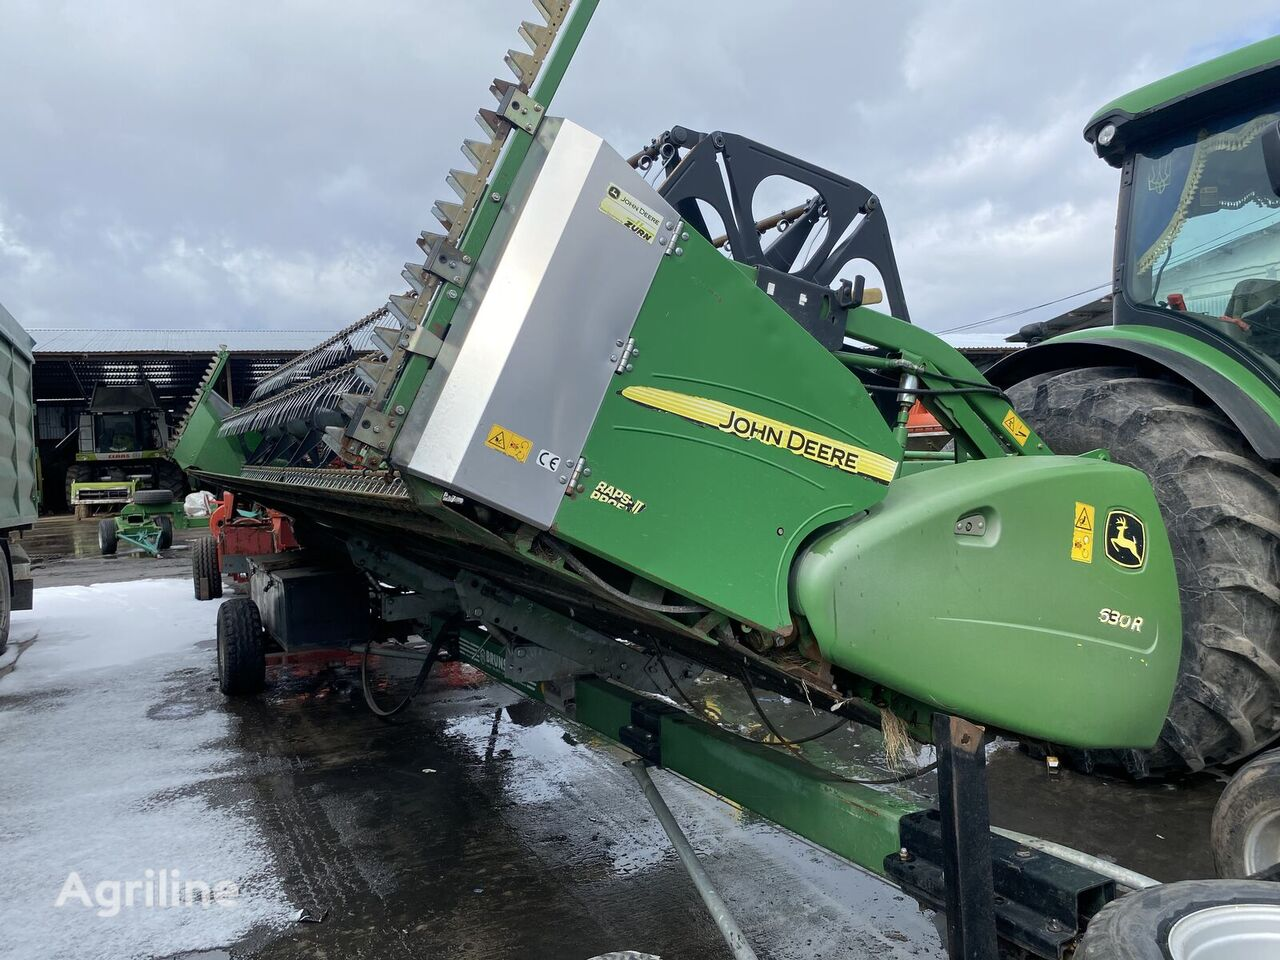 JOHN DEERE 630R/635r grain header